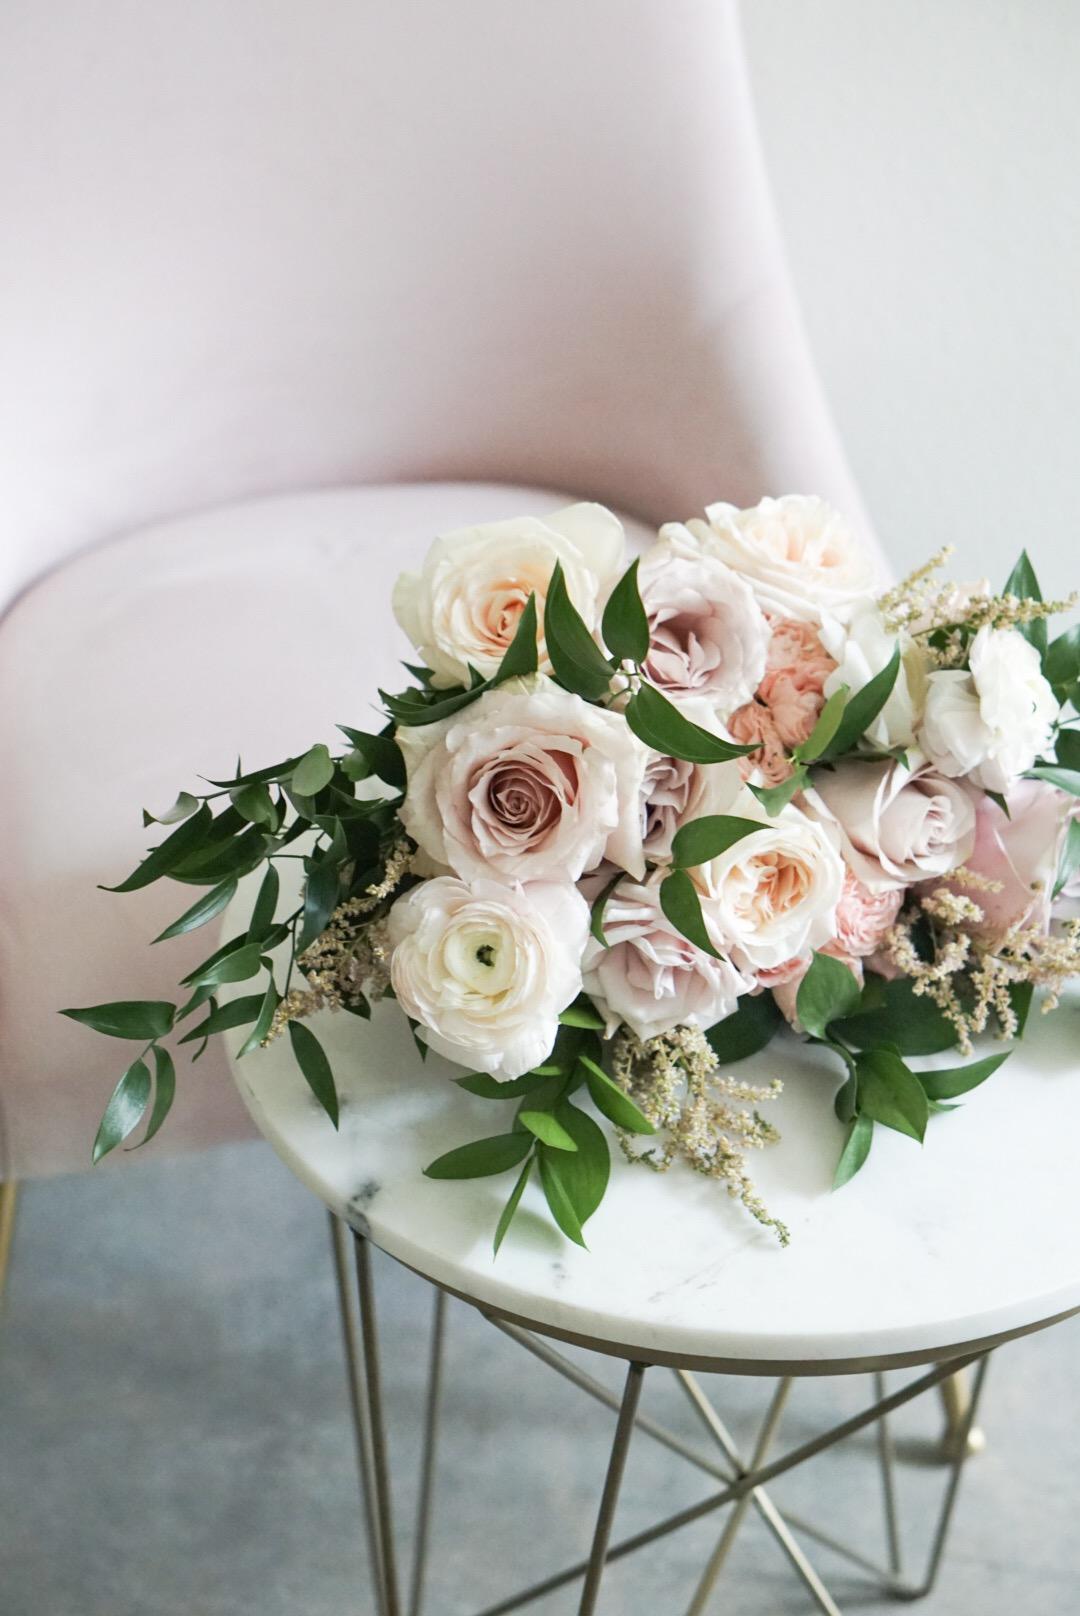 sav floral desgin